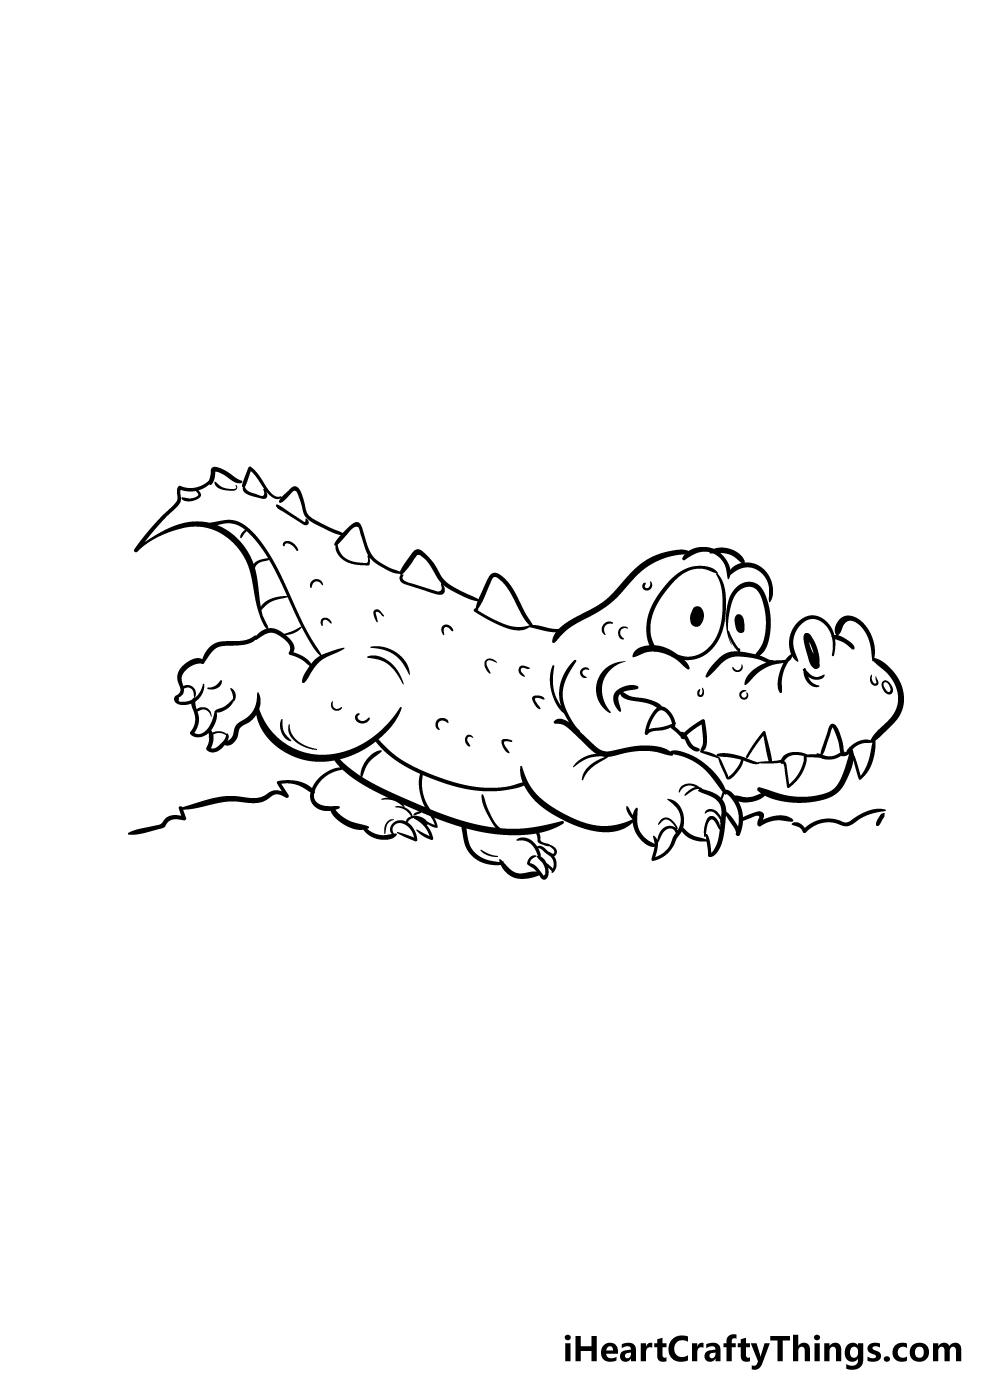 crocodile drawing step 7